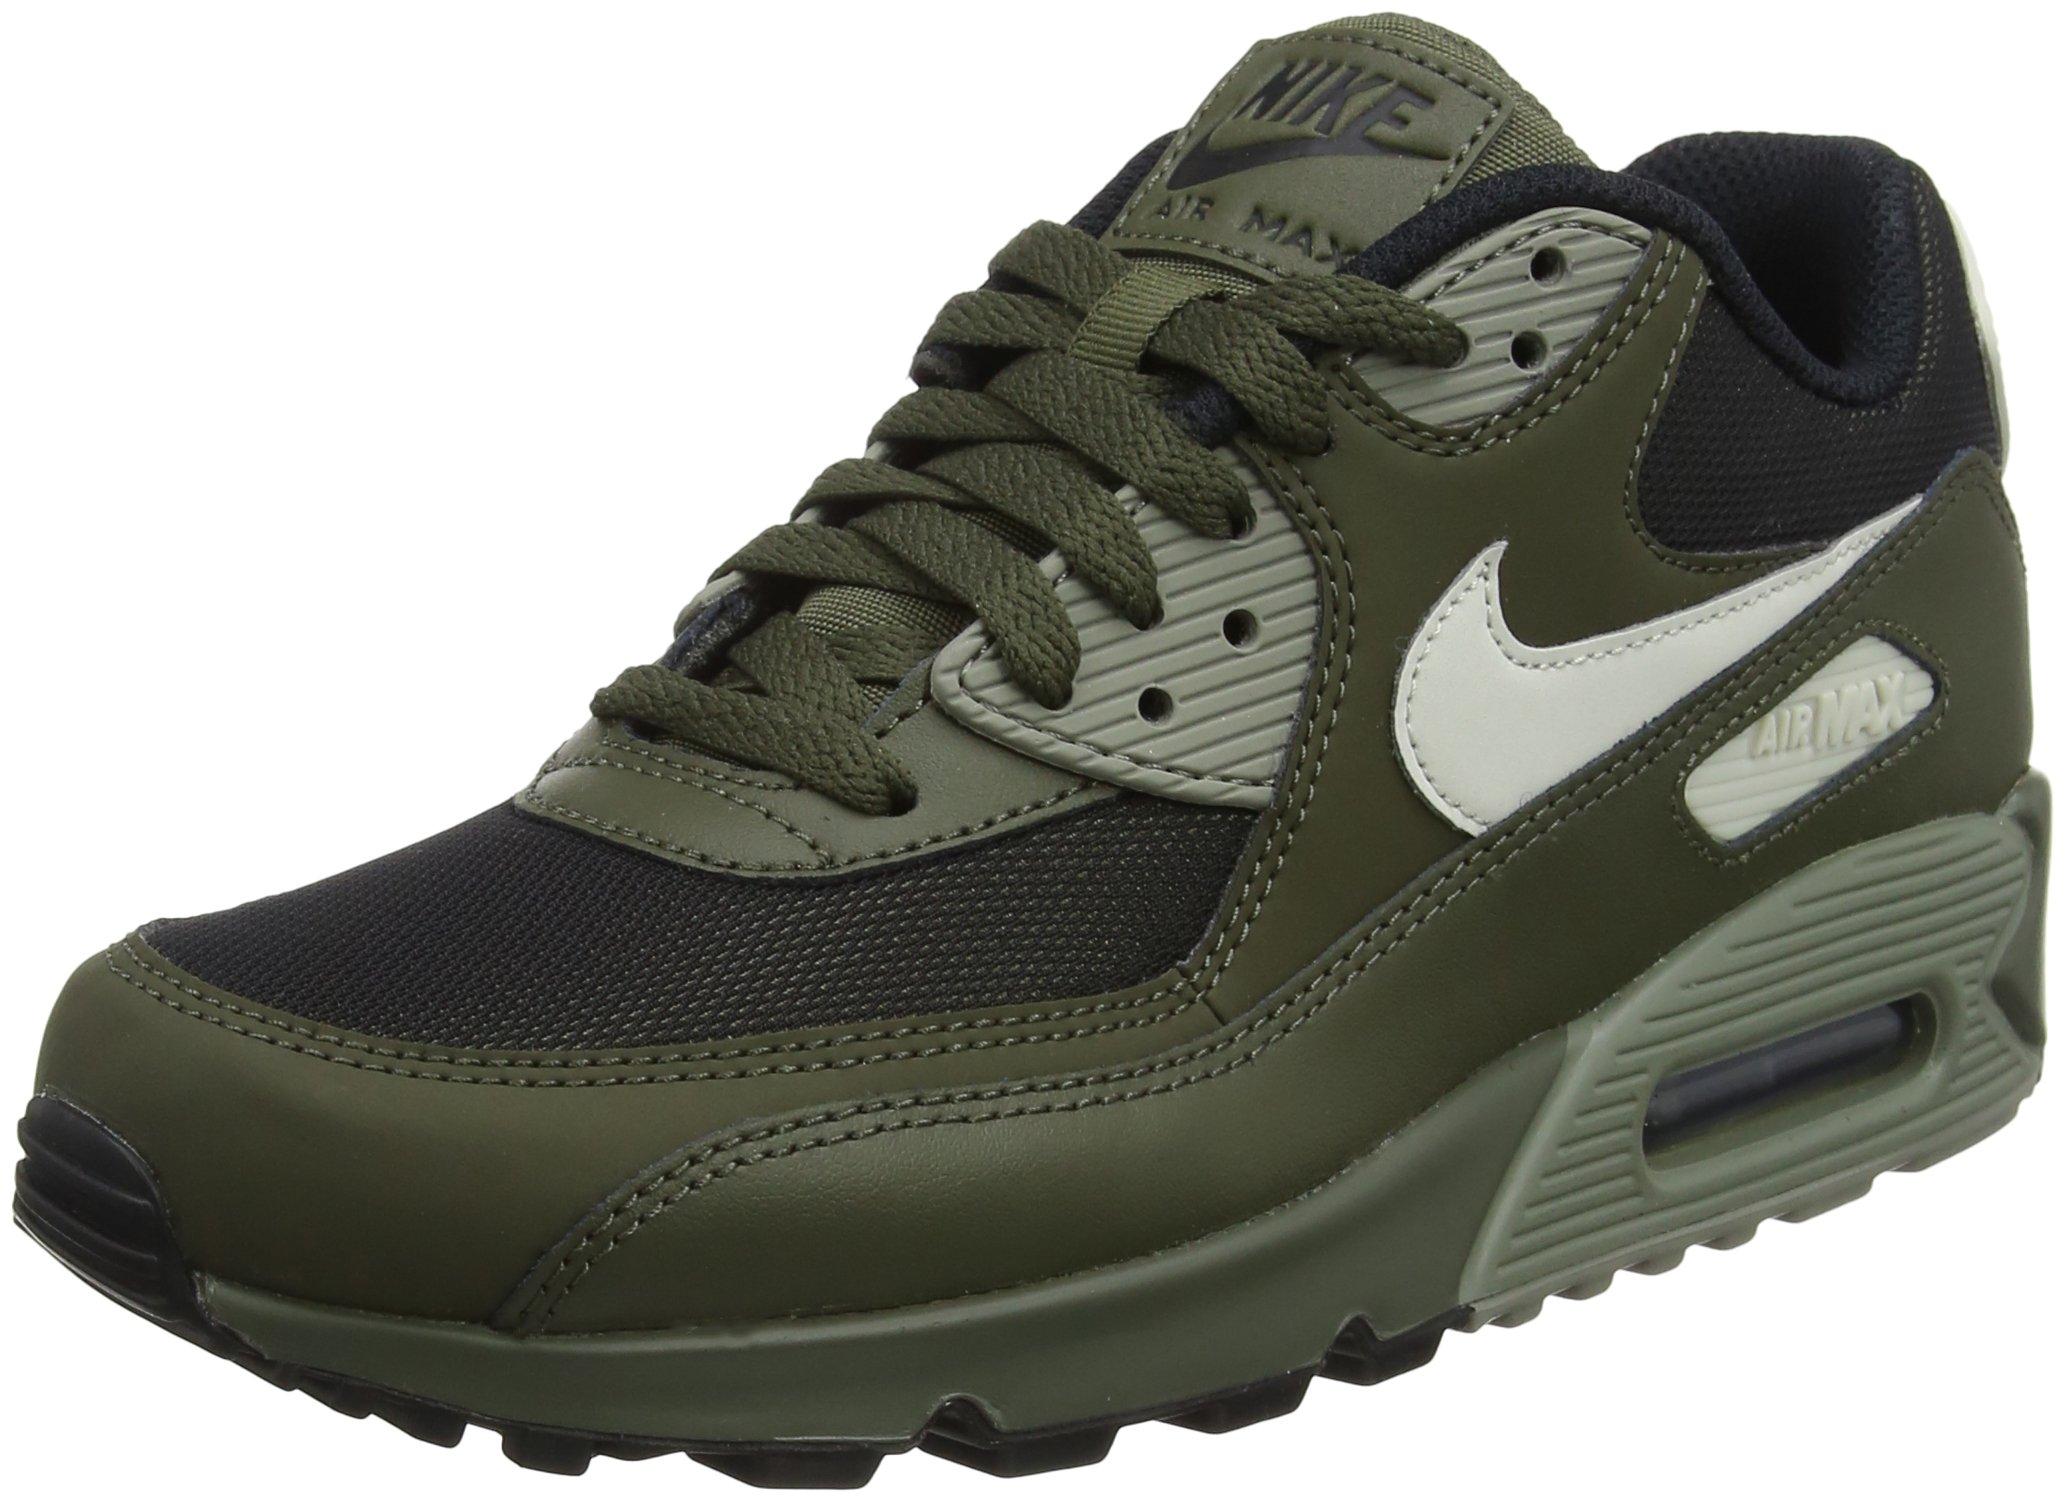 wholesale dealer 89a1a 4ad3f Galleon - NIKE Men s Air Max  90 Shoes Cargo Khaki Light Bone 8